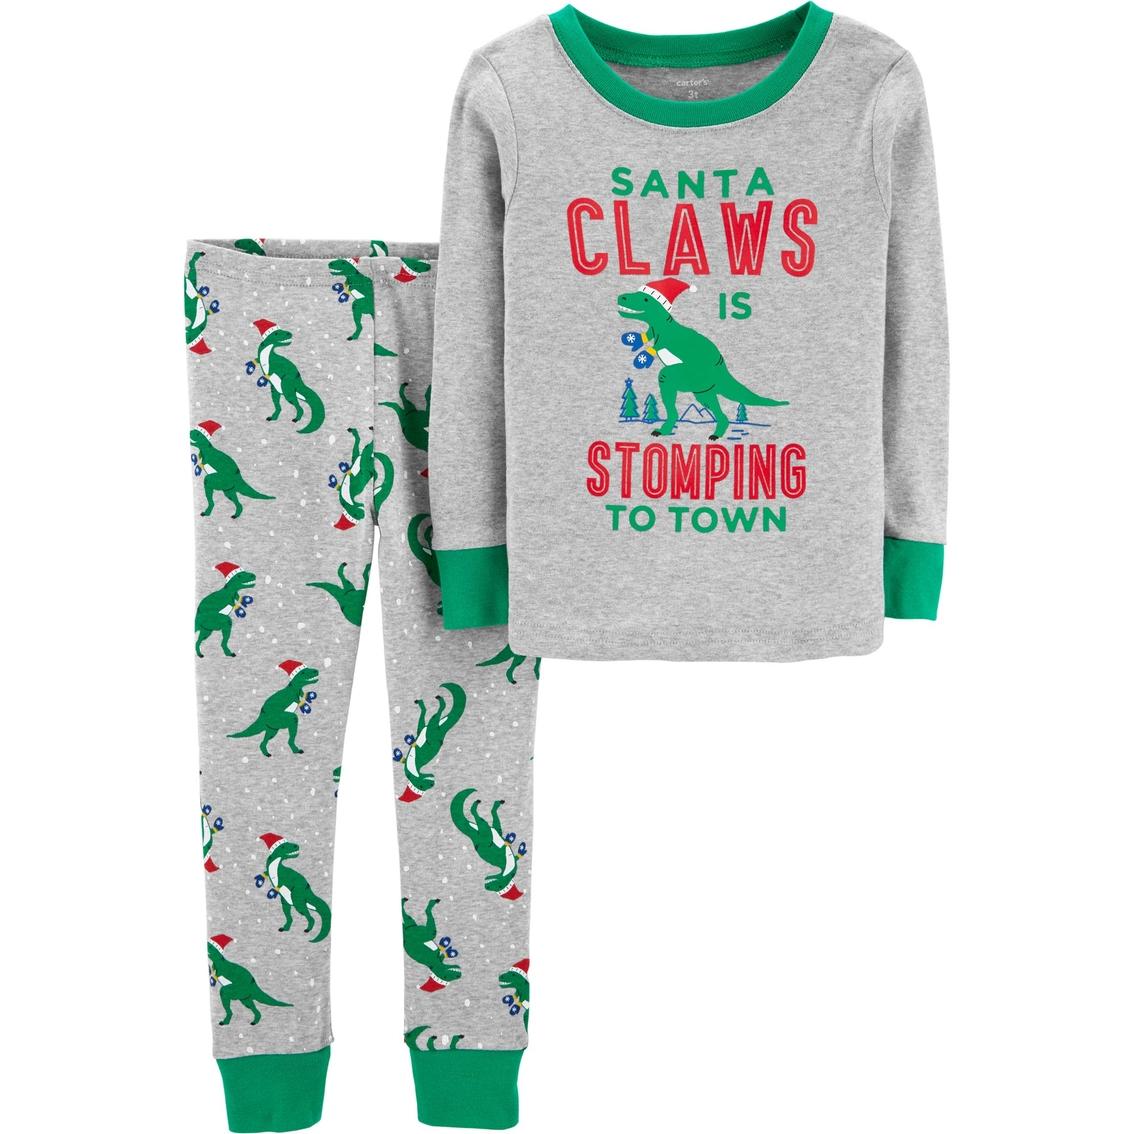 Carter s Toddler Boys Santa Claws 2 Pc. Pajama Set  6af16bacf